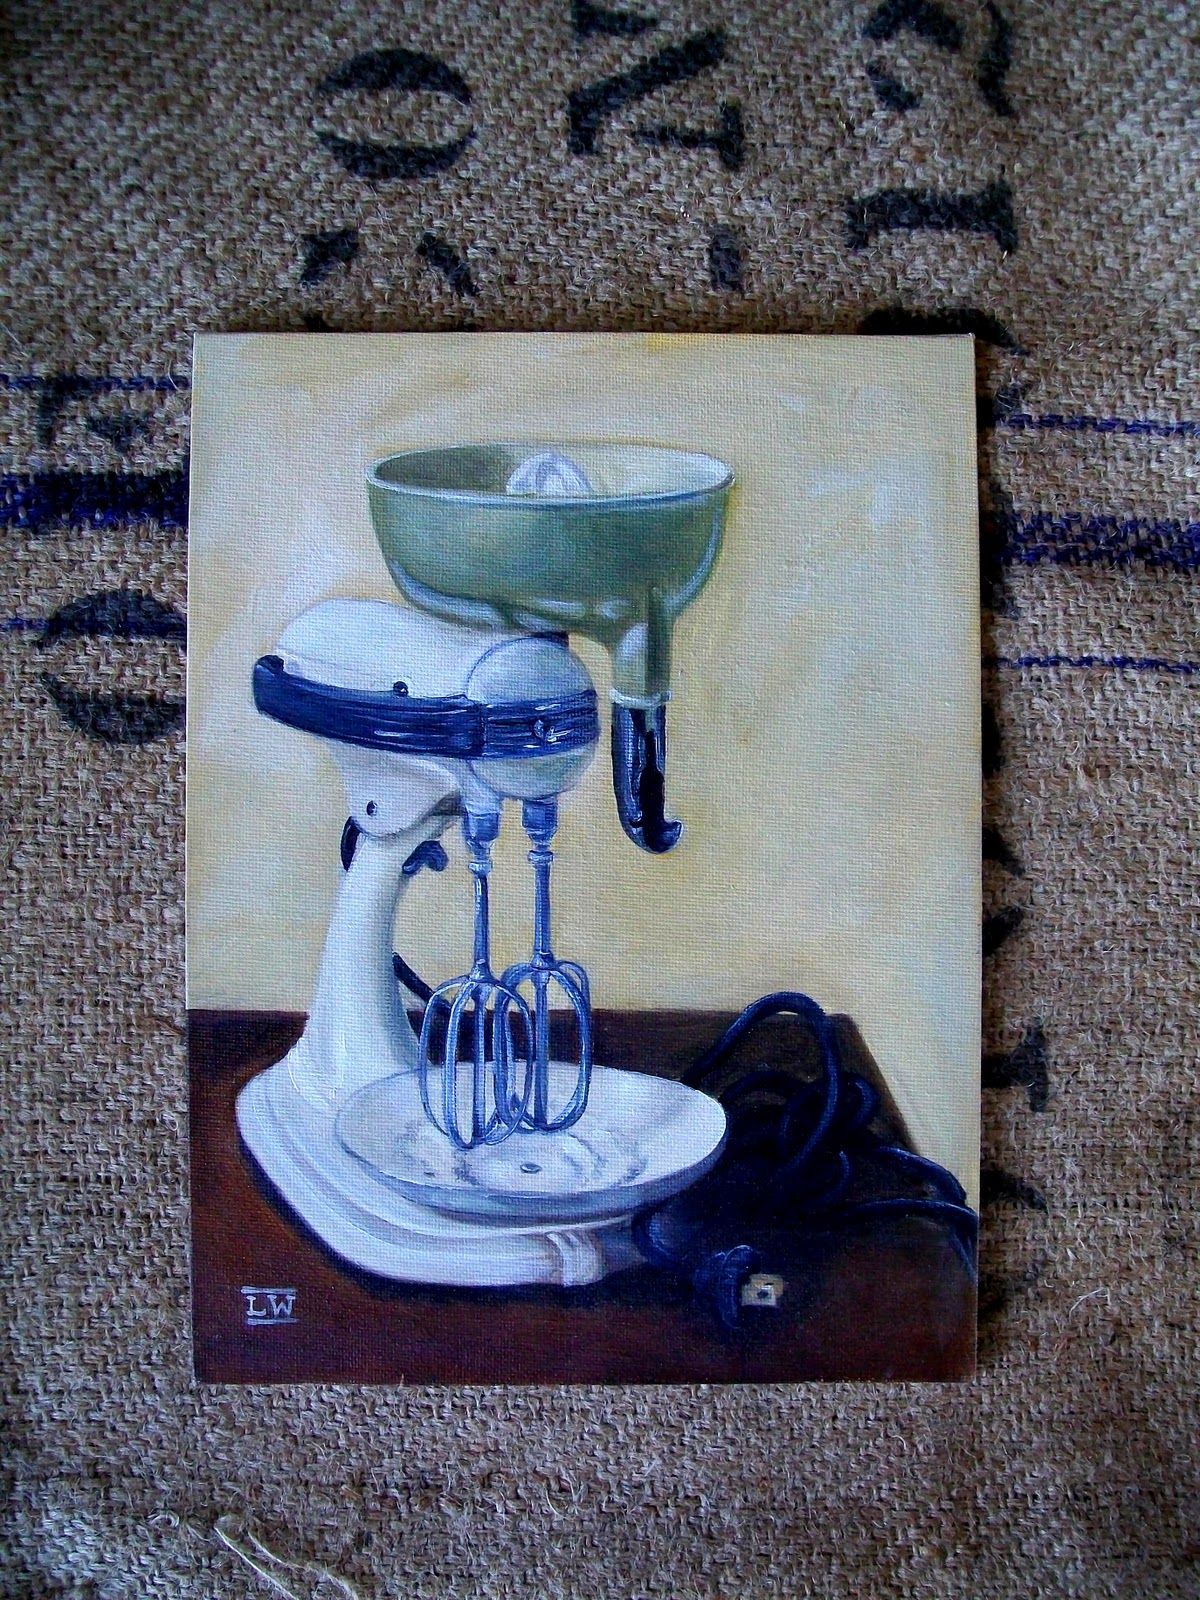 Cottage Hill: Vintage KitchenAid Mixer - Painting